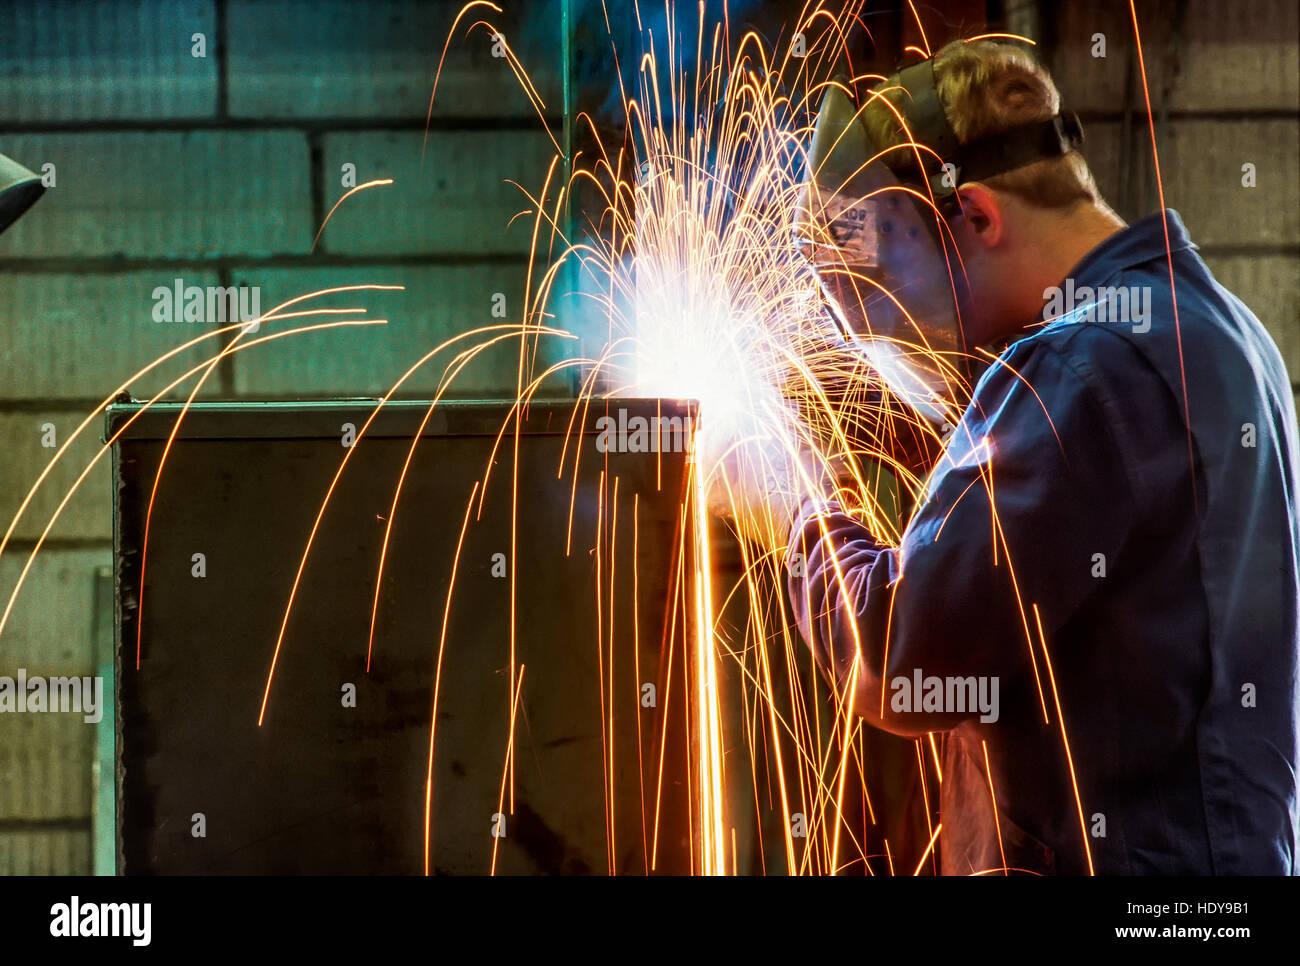 Acetylene welder working on a furnace unit in a German machine factory. - Stock Image